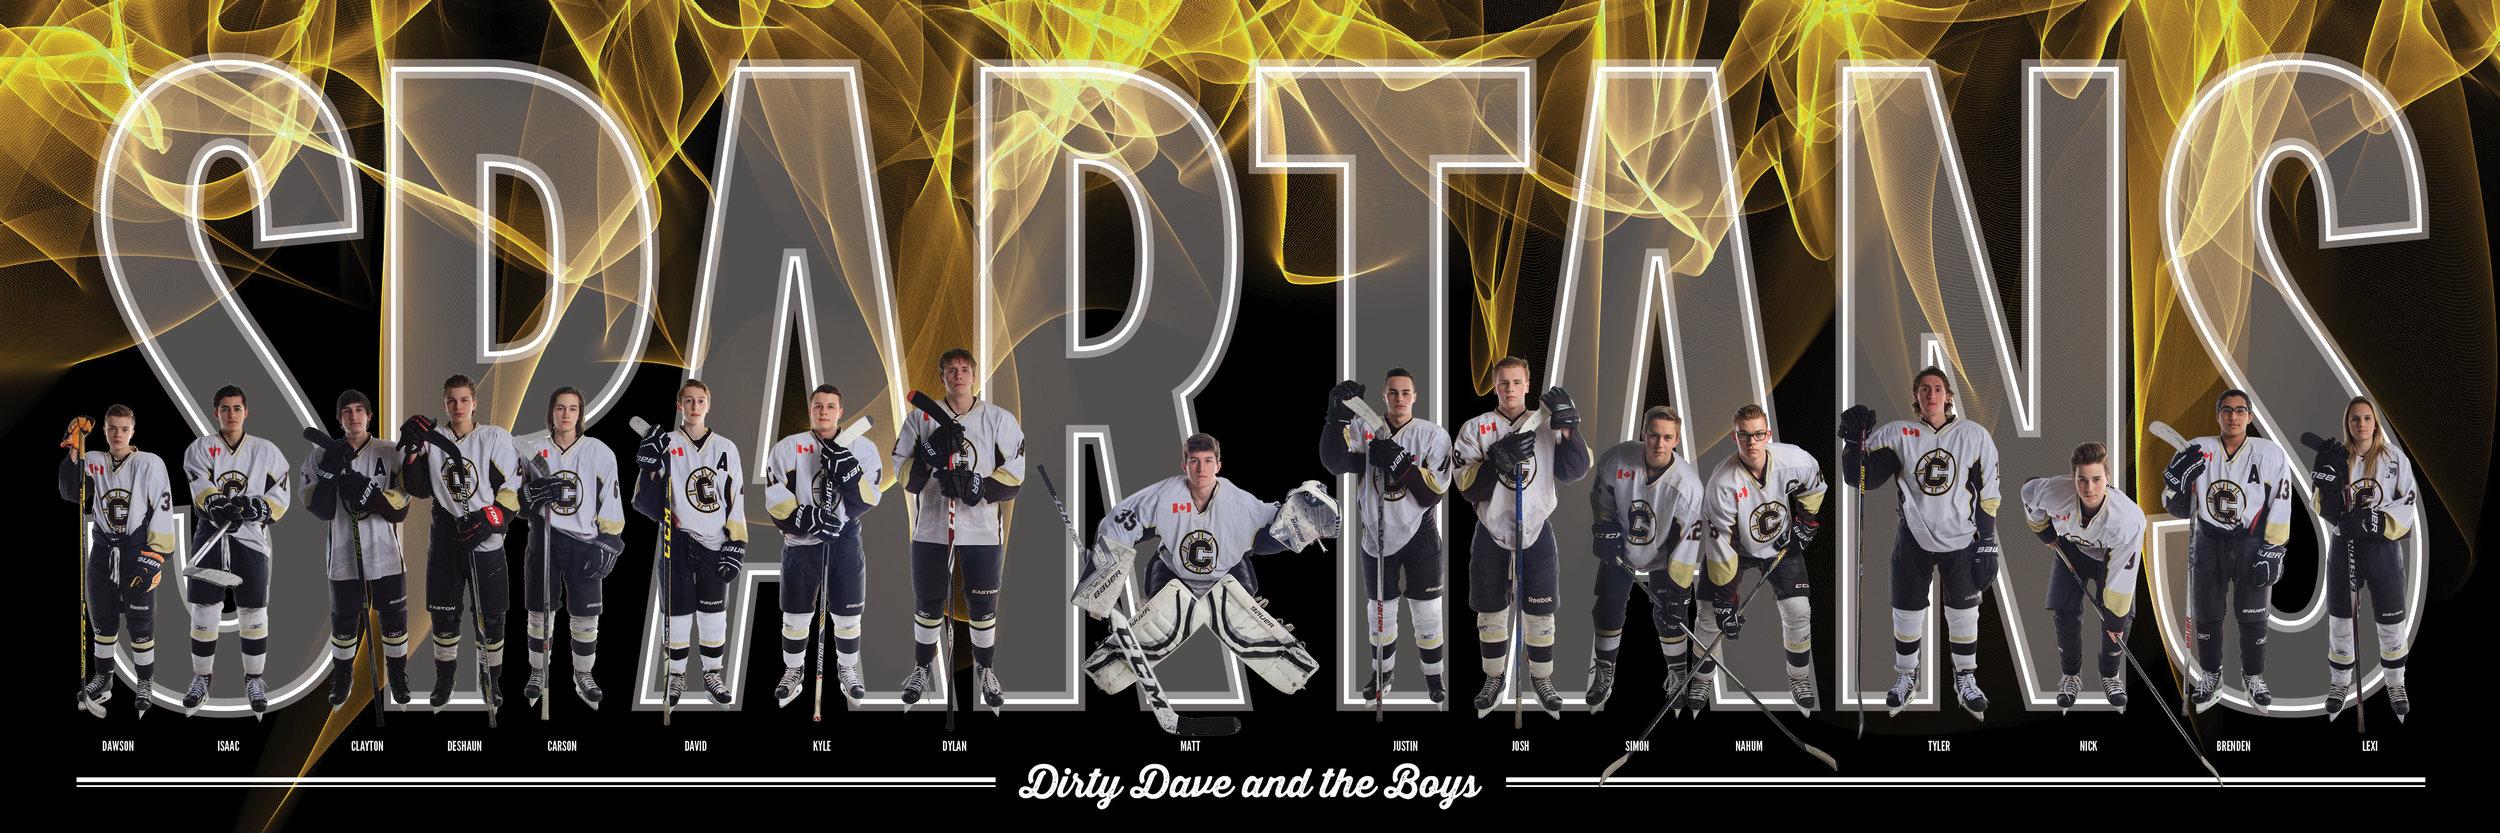 Spartans-Hockey-Team-36x12-Proof.jpg